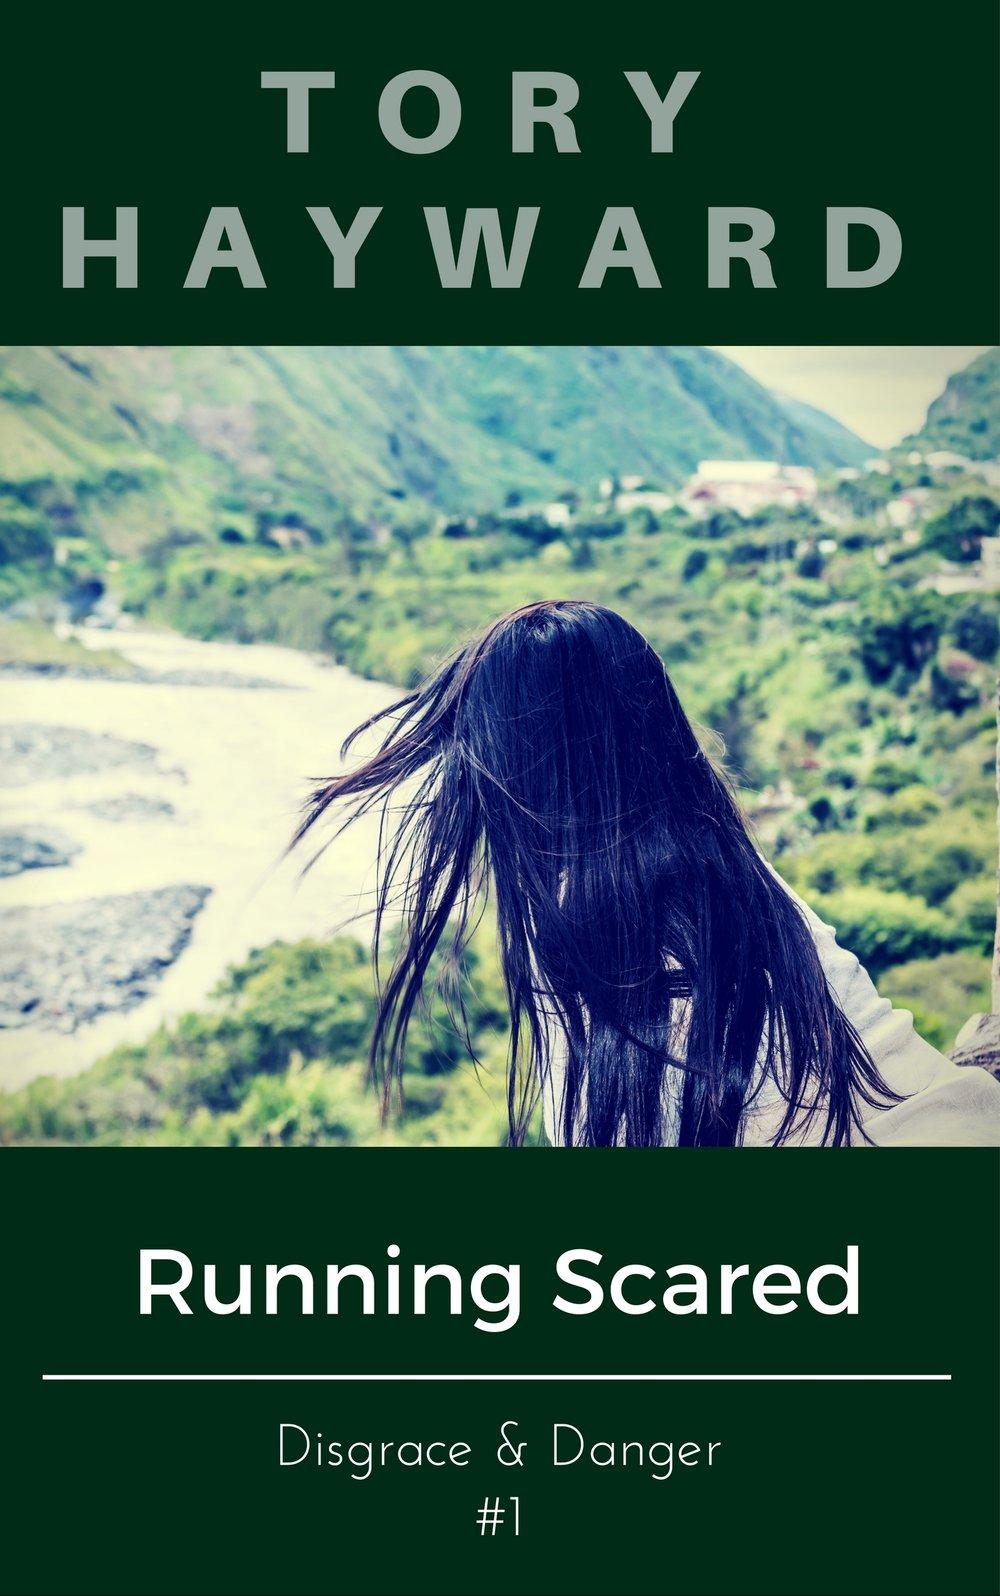 Danger & Disgrace #1: Running Scared